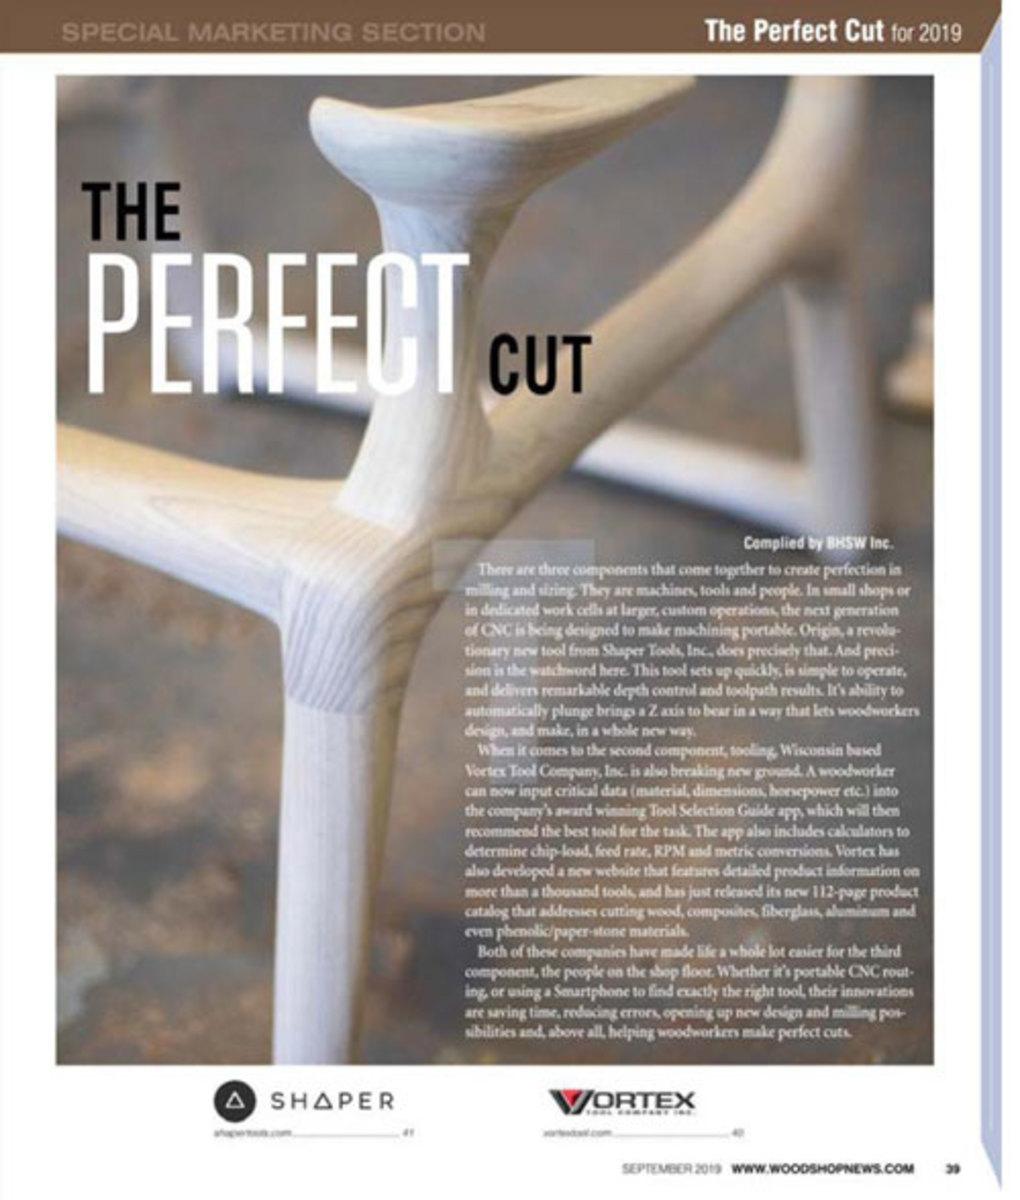 Wood-Shop-News-The-Perfect-Cut